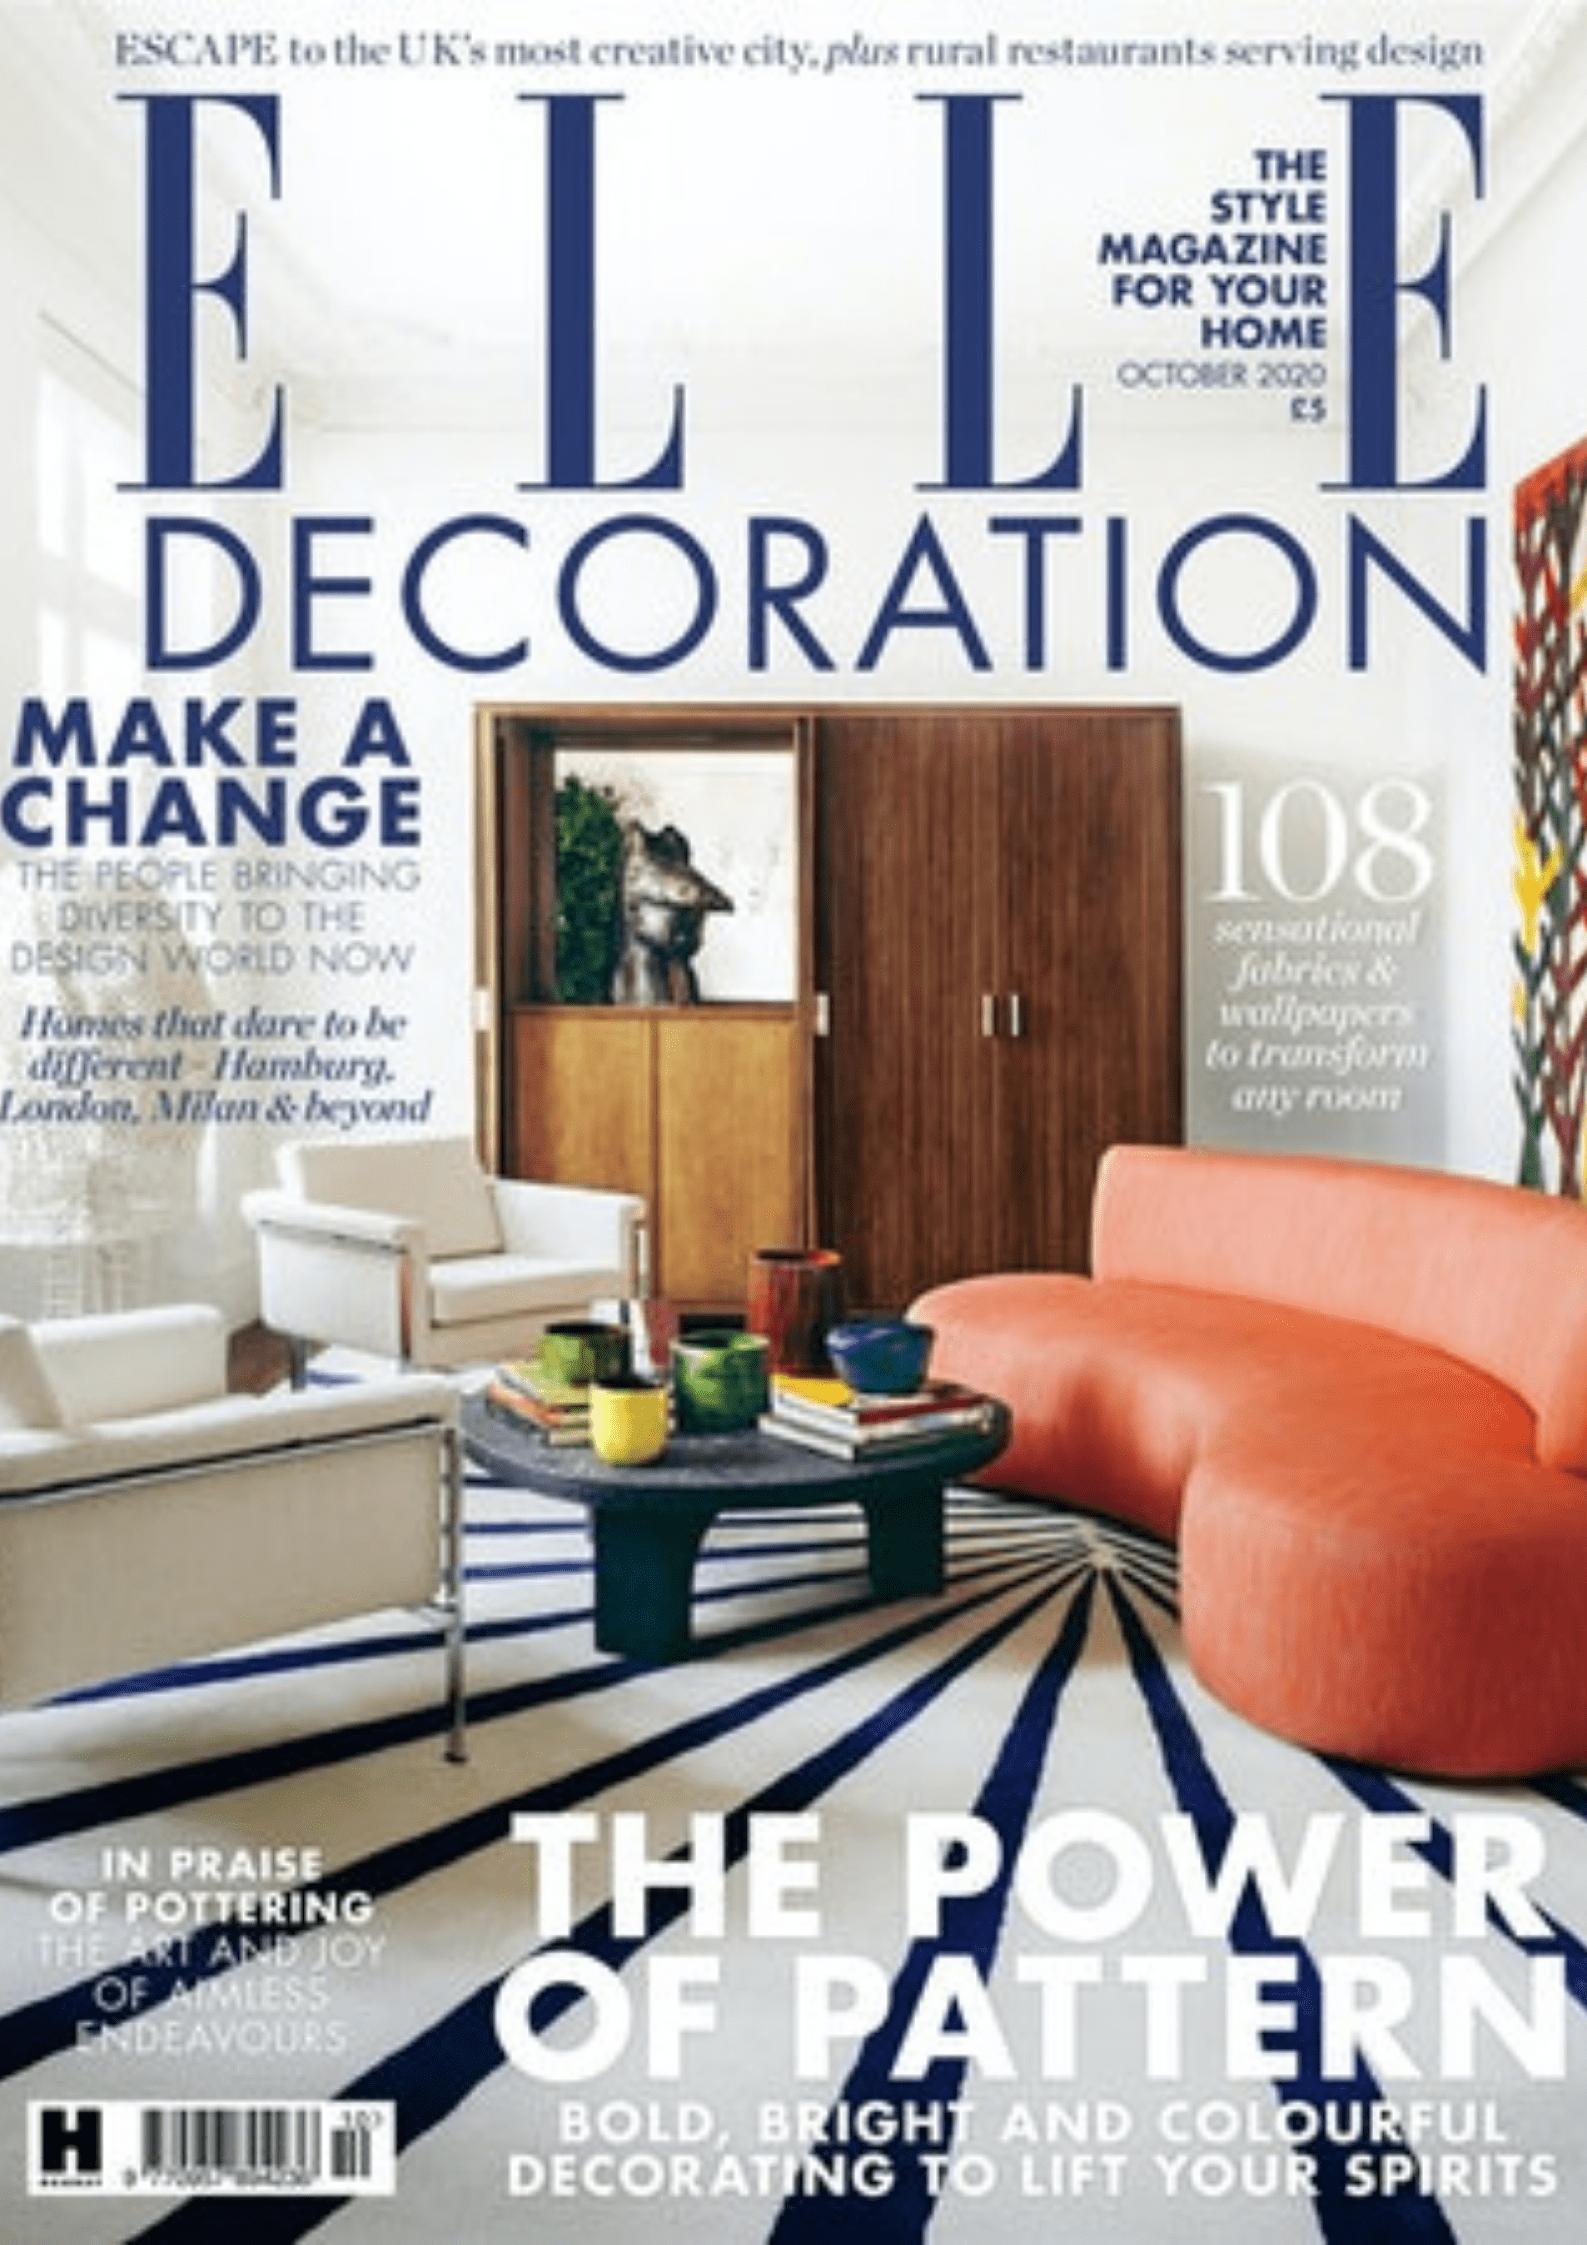 Most known interior design magazines - elle decor